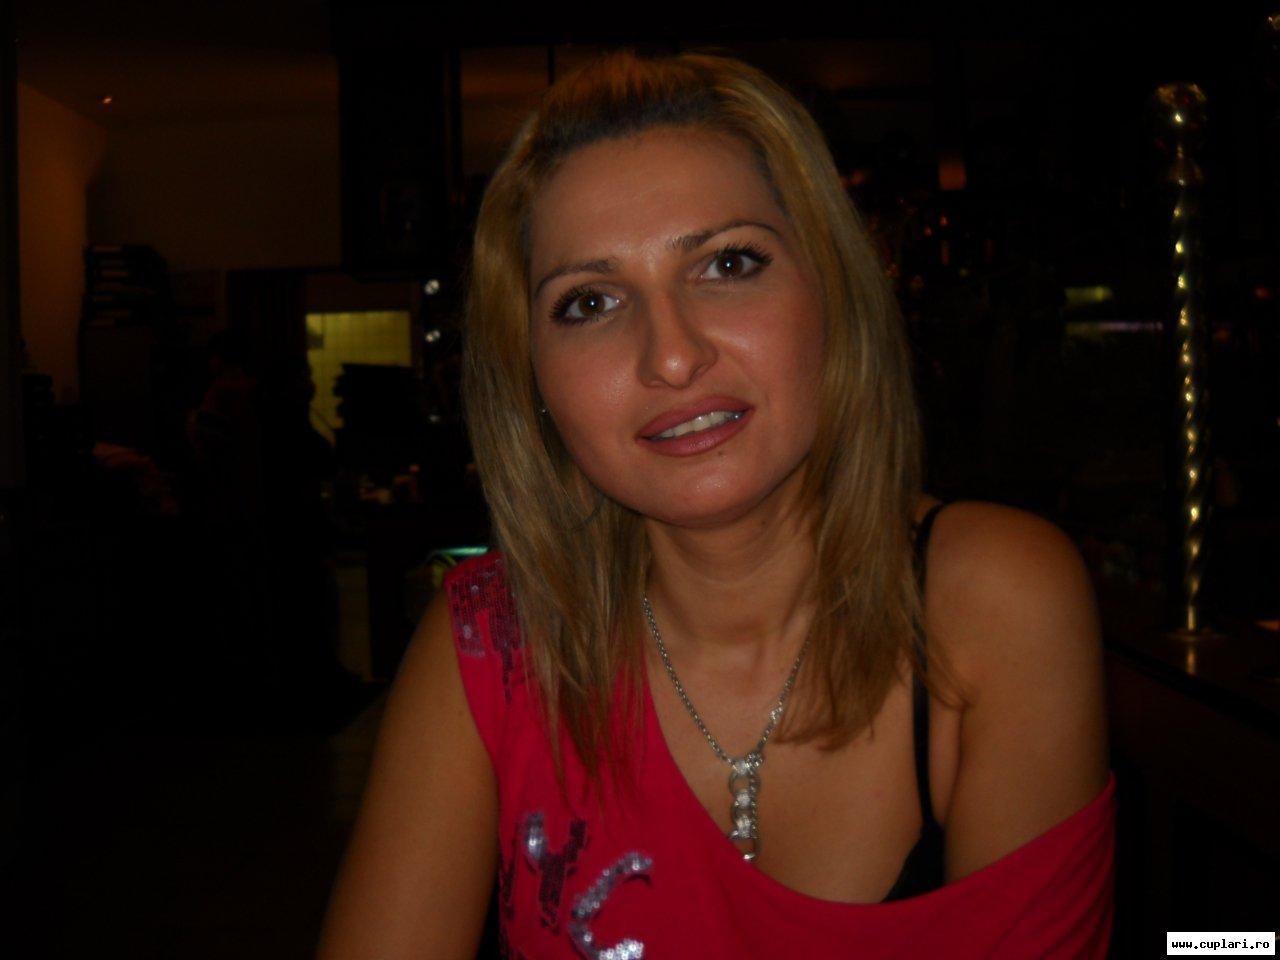 matrimoniale femei 35 45 ani